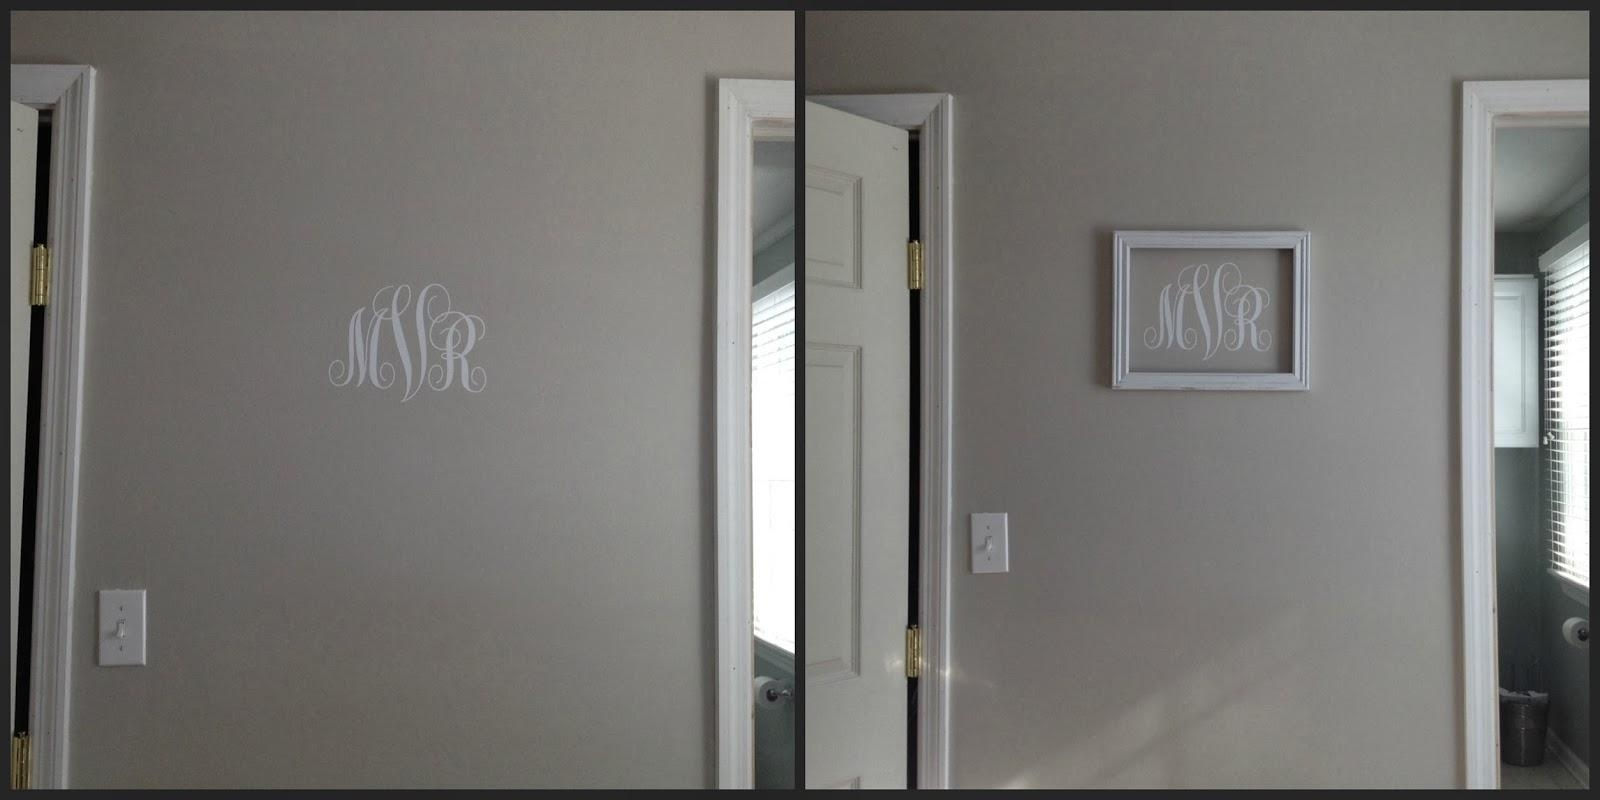 Silhouette} Vinyl Monogram Wall Art – Silhouette School In Framed Monogram Wall Art (Image 12 of 20)